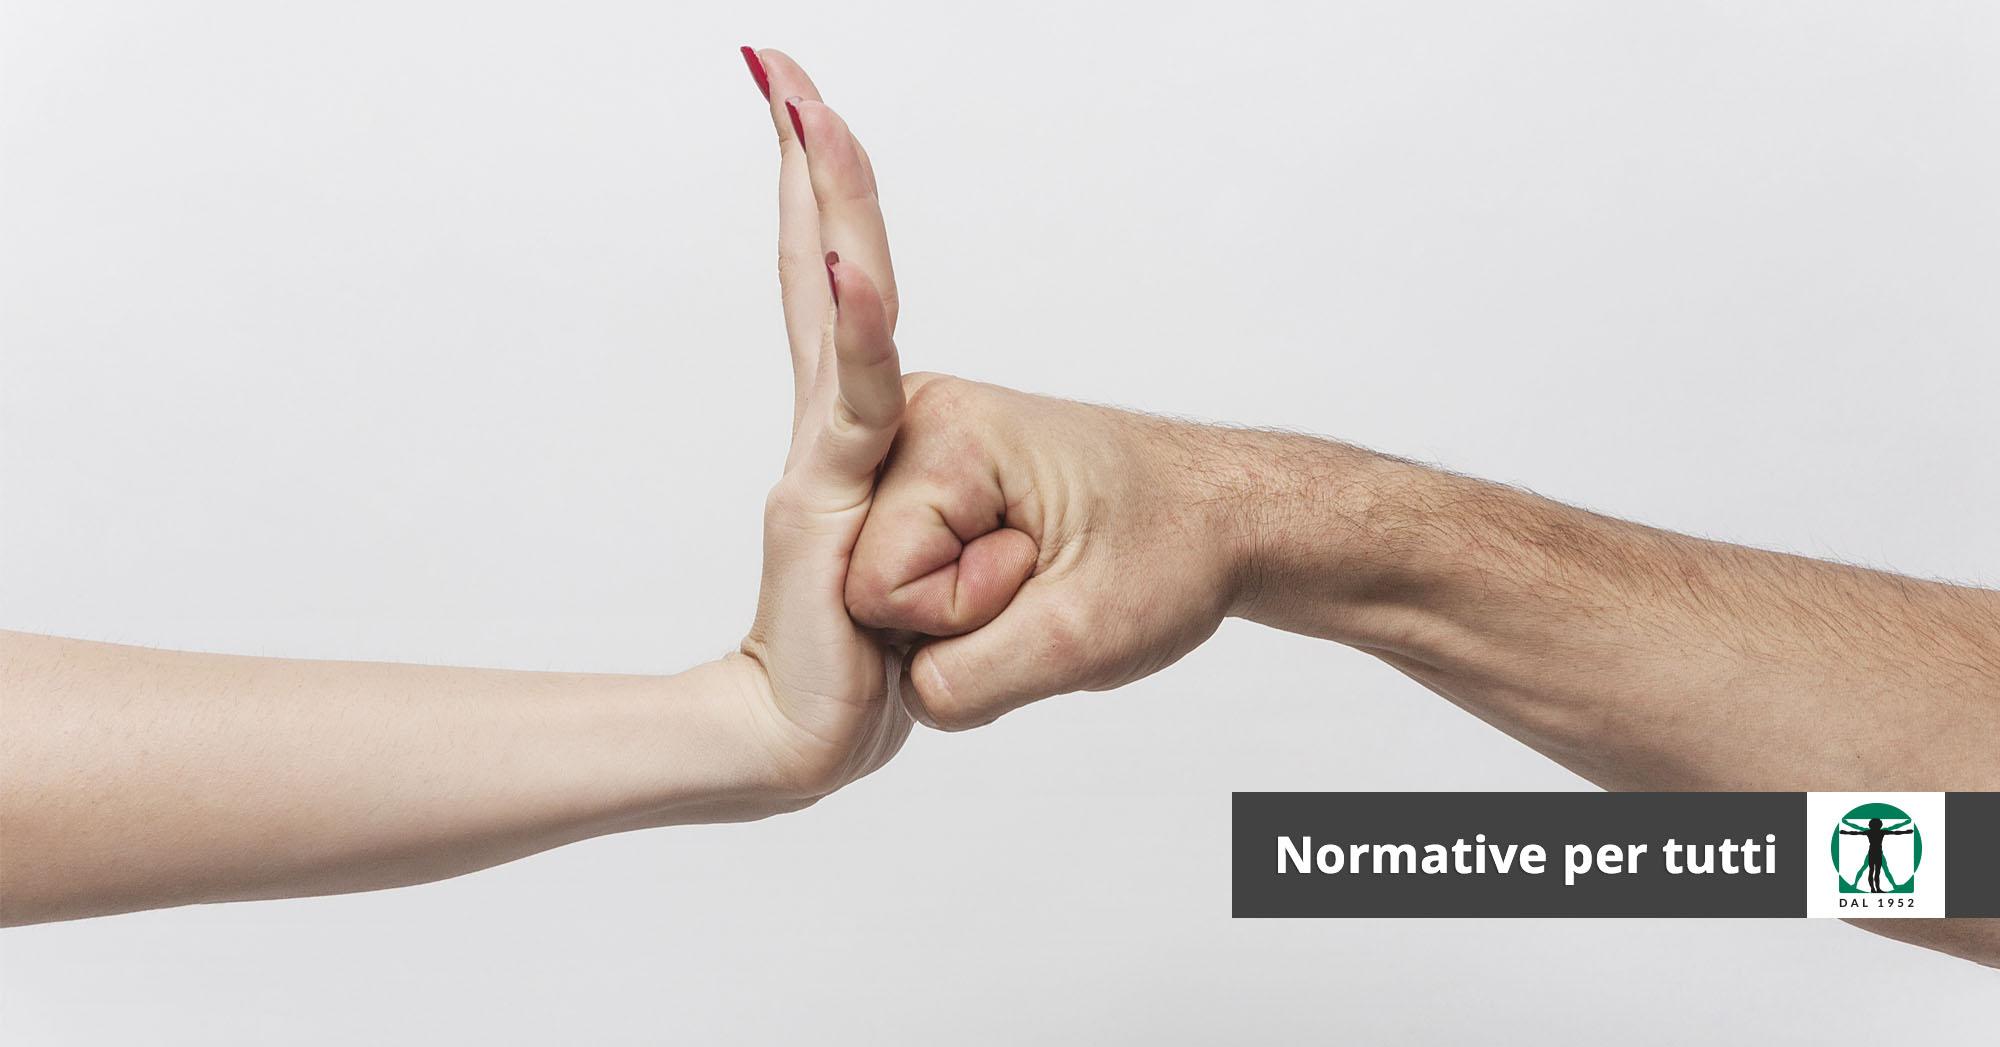 mani combattimento, Infortunistica Tossani